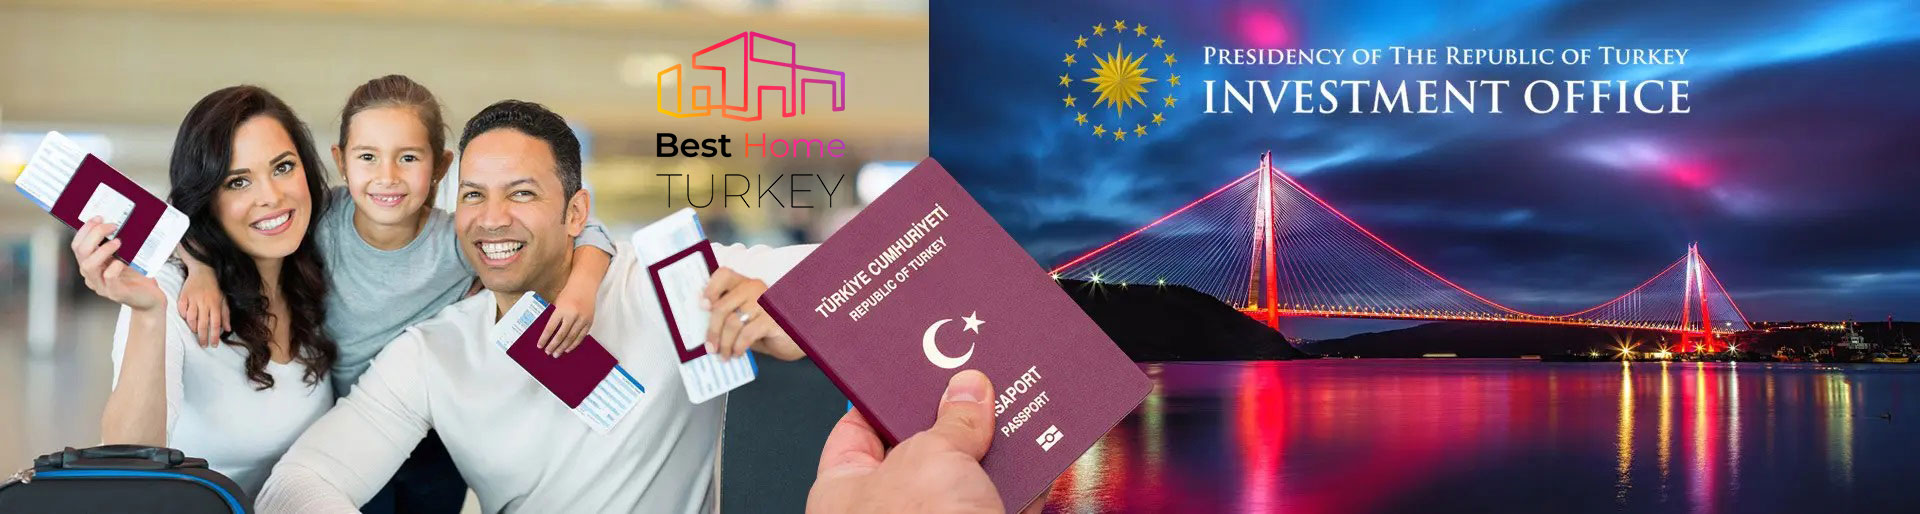 دریافت پاسپورت ترکیه دریافت شهروندی ترکیه